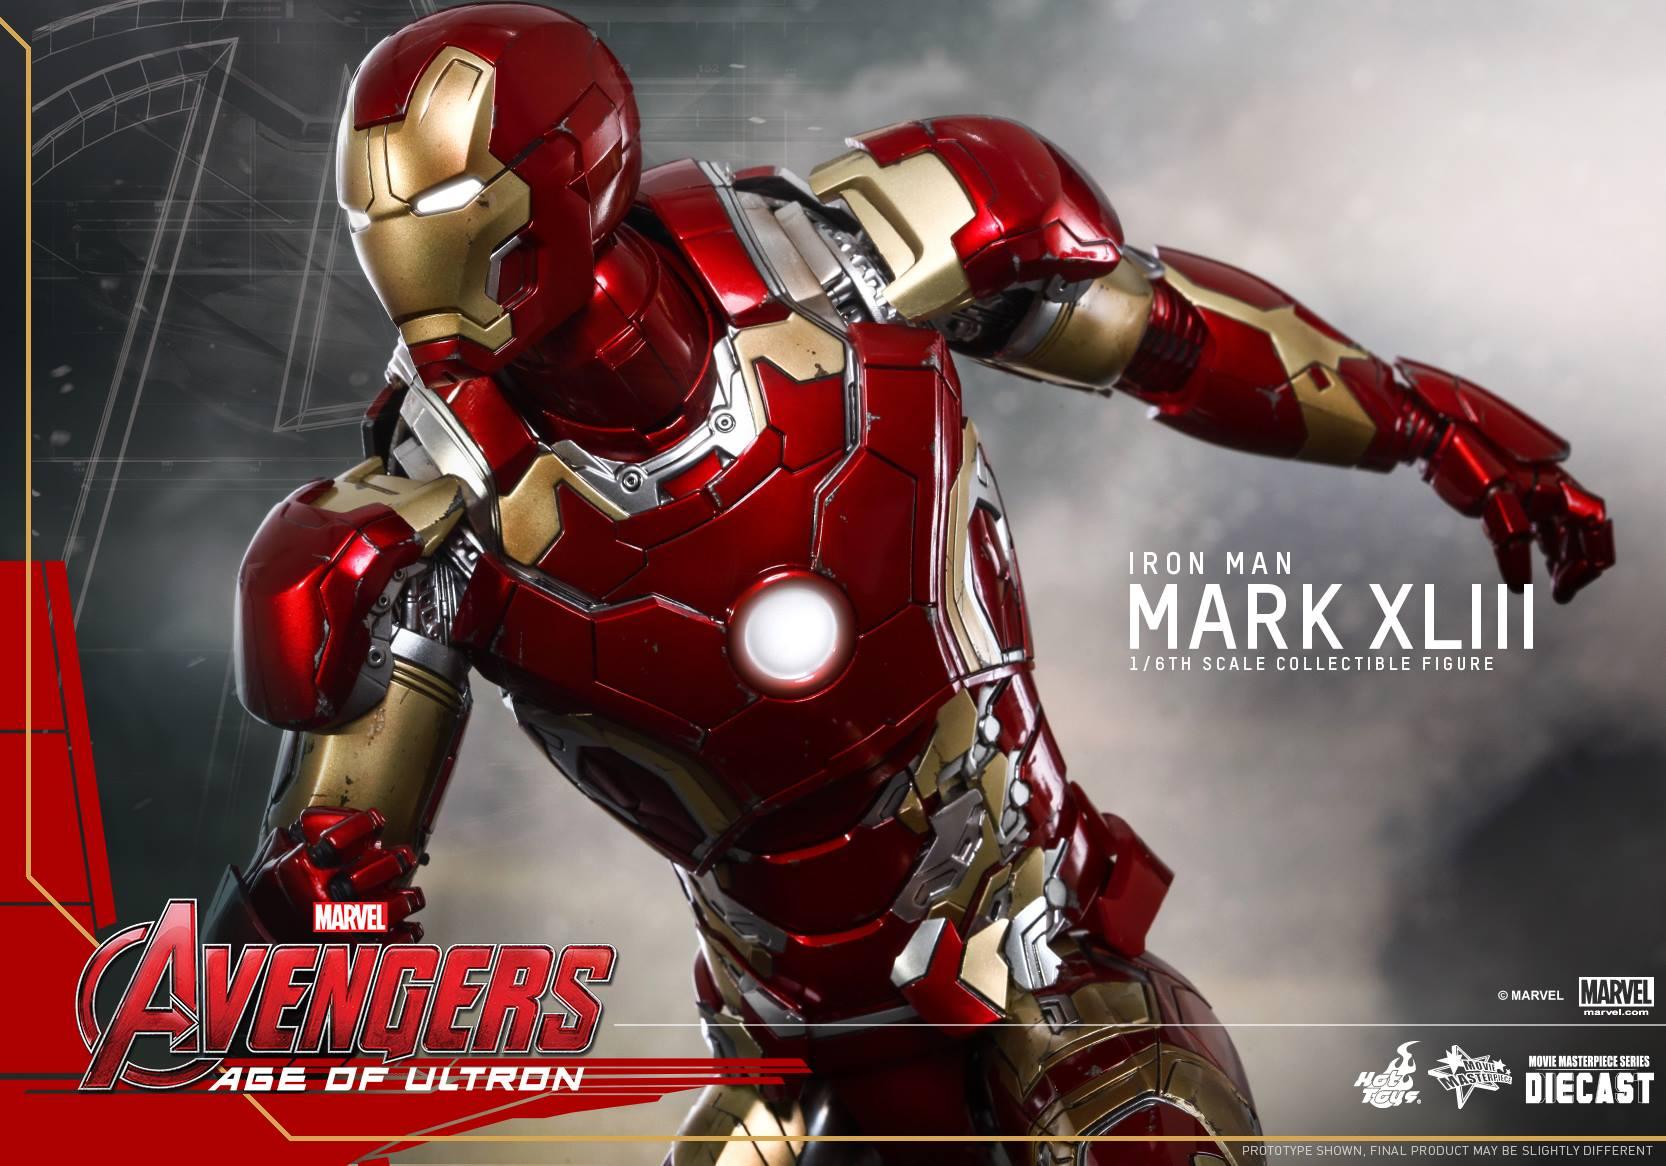 Hot Toys' Avengers: Age of Ultron Iron Man Suit Revealed